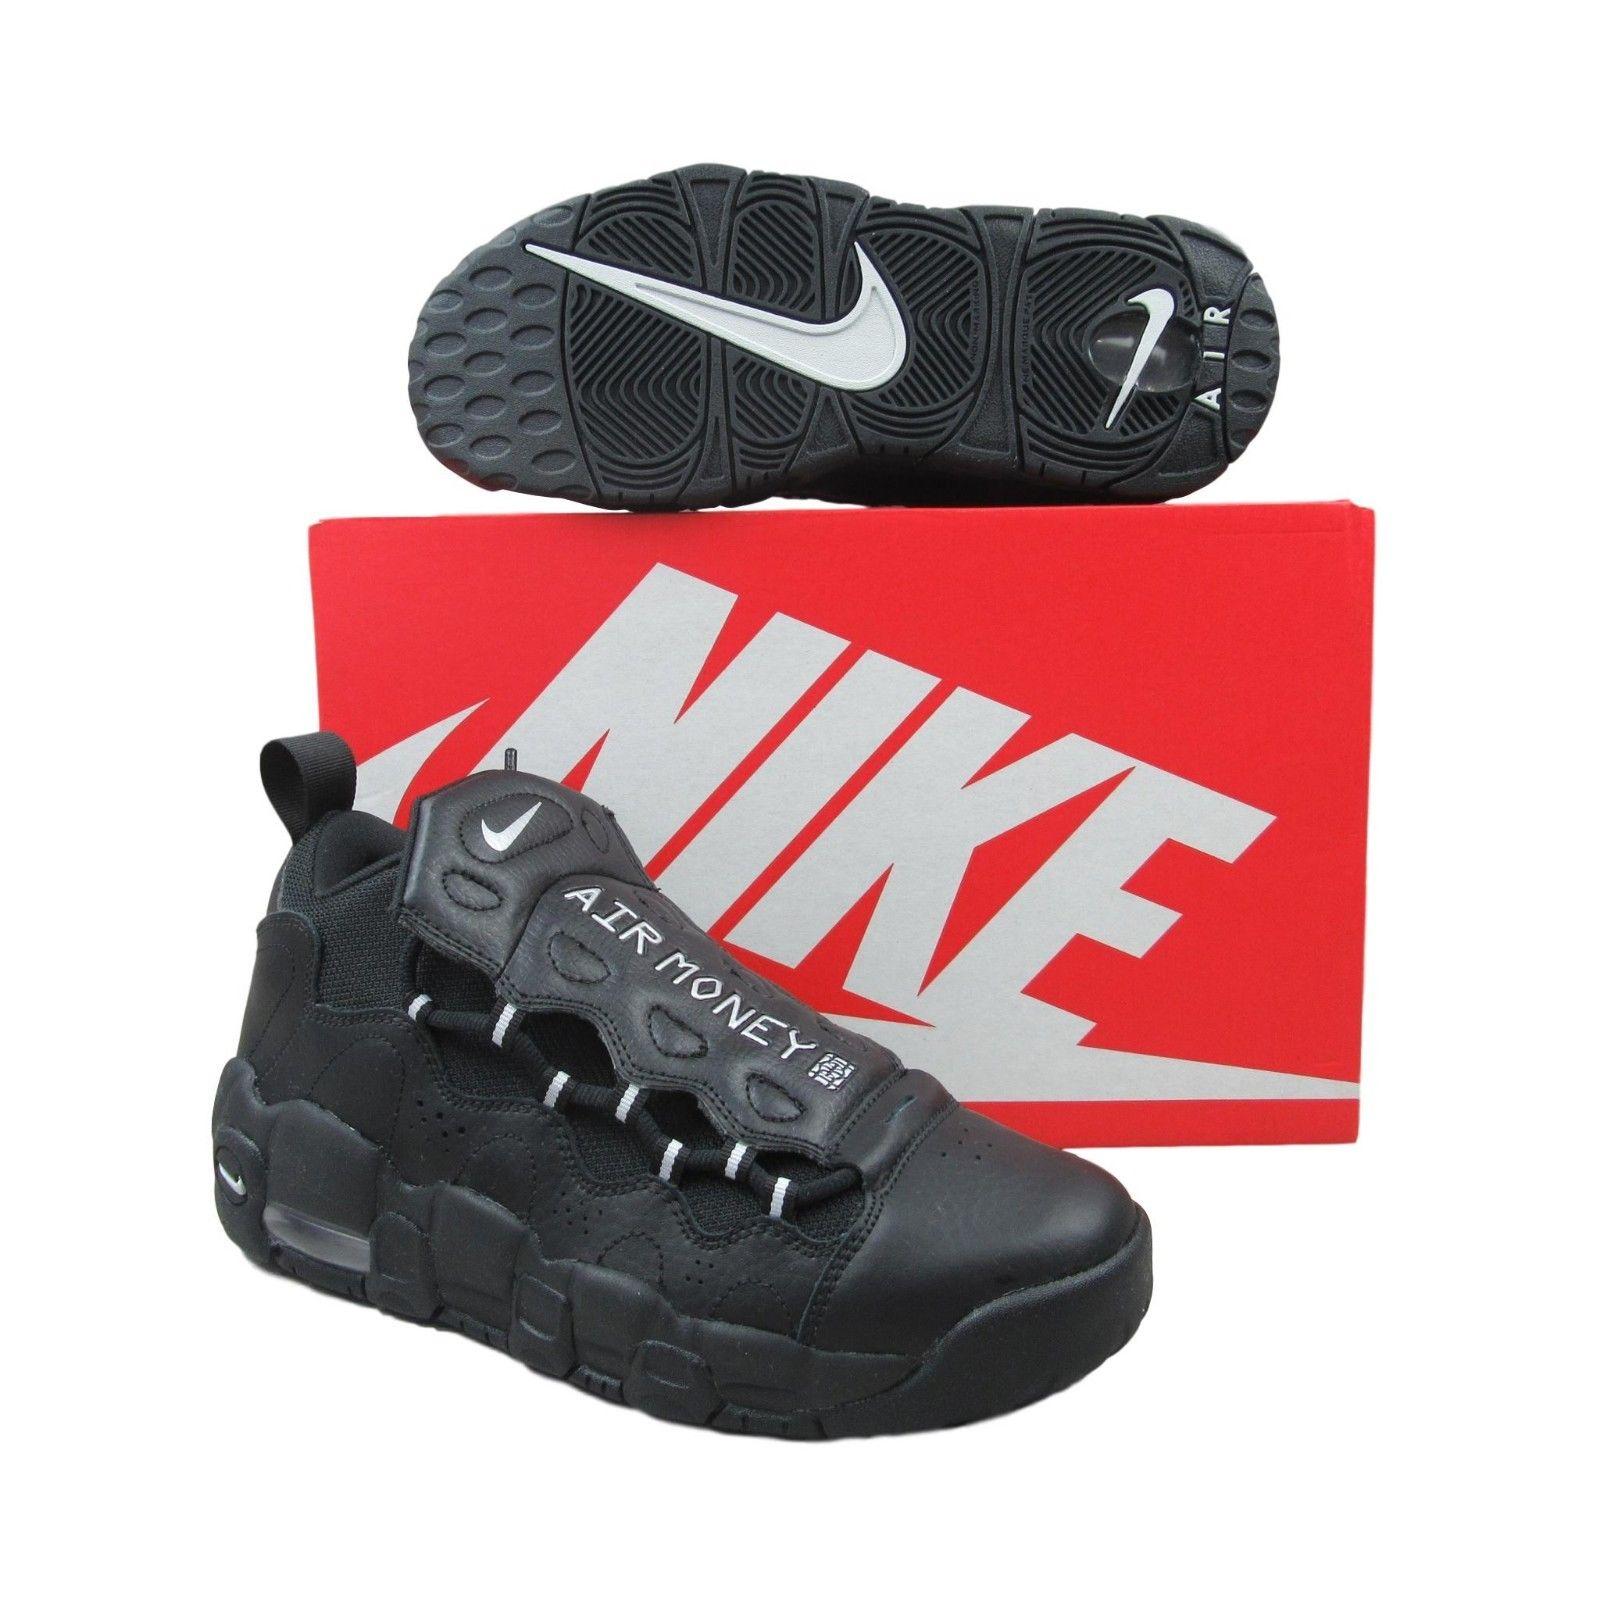 db2f61a5a4c ... Kids Basketball Shoes Size 6 5Y Black AH5215 nike air more money gs kids  basketball shoes Source · Nike Kids Air Jordan Retro 12 Royal Blue 130490  113 ...